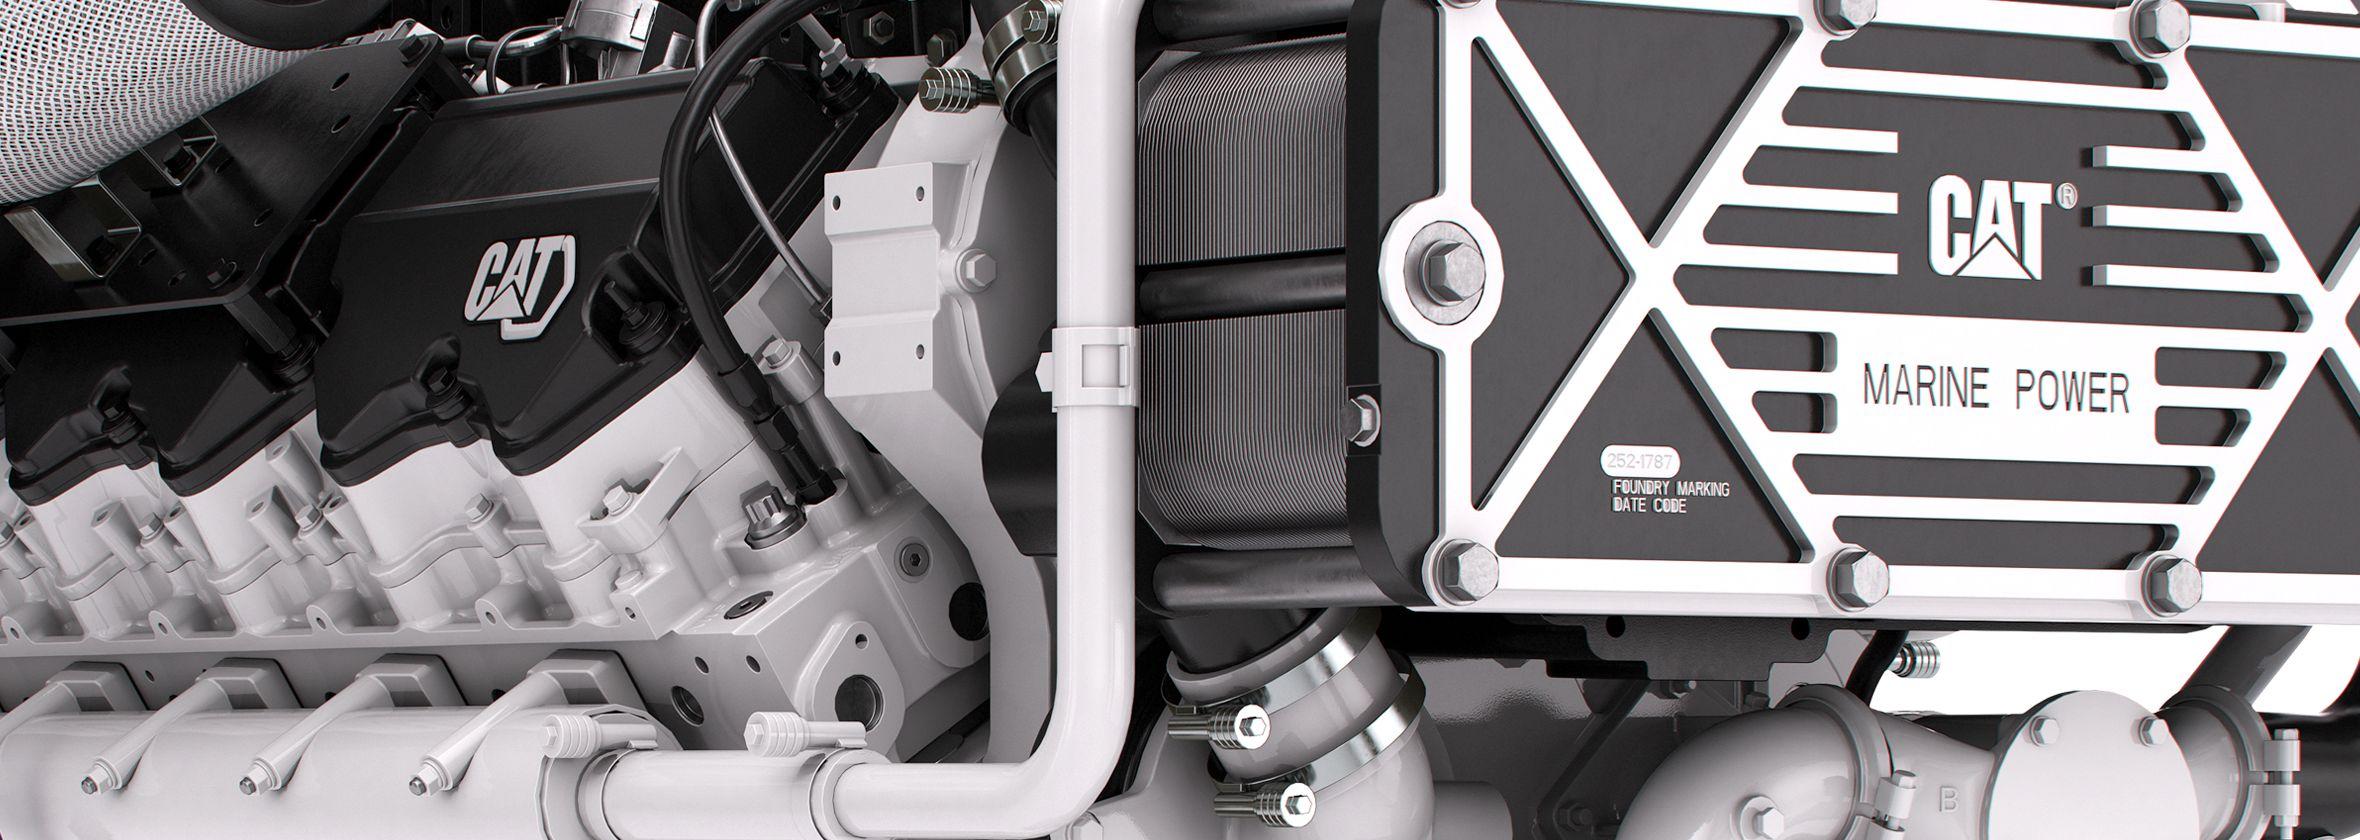 C32B marine engine